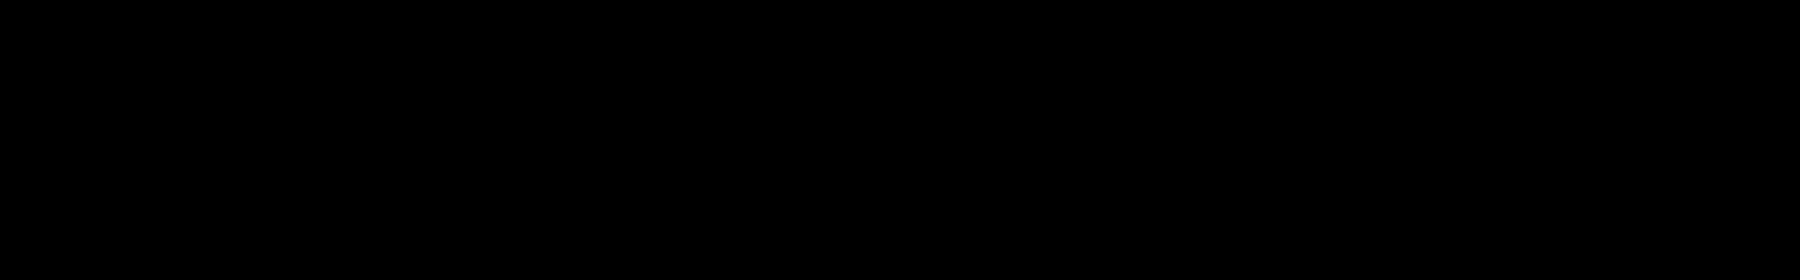 Slo-Mo Chilled Beats V2 audio waveform